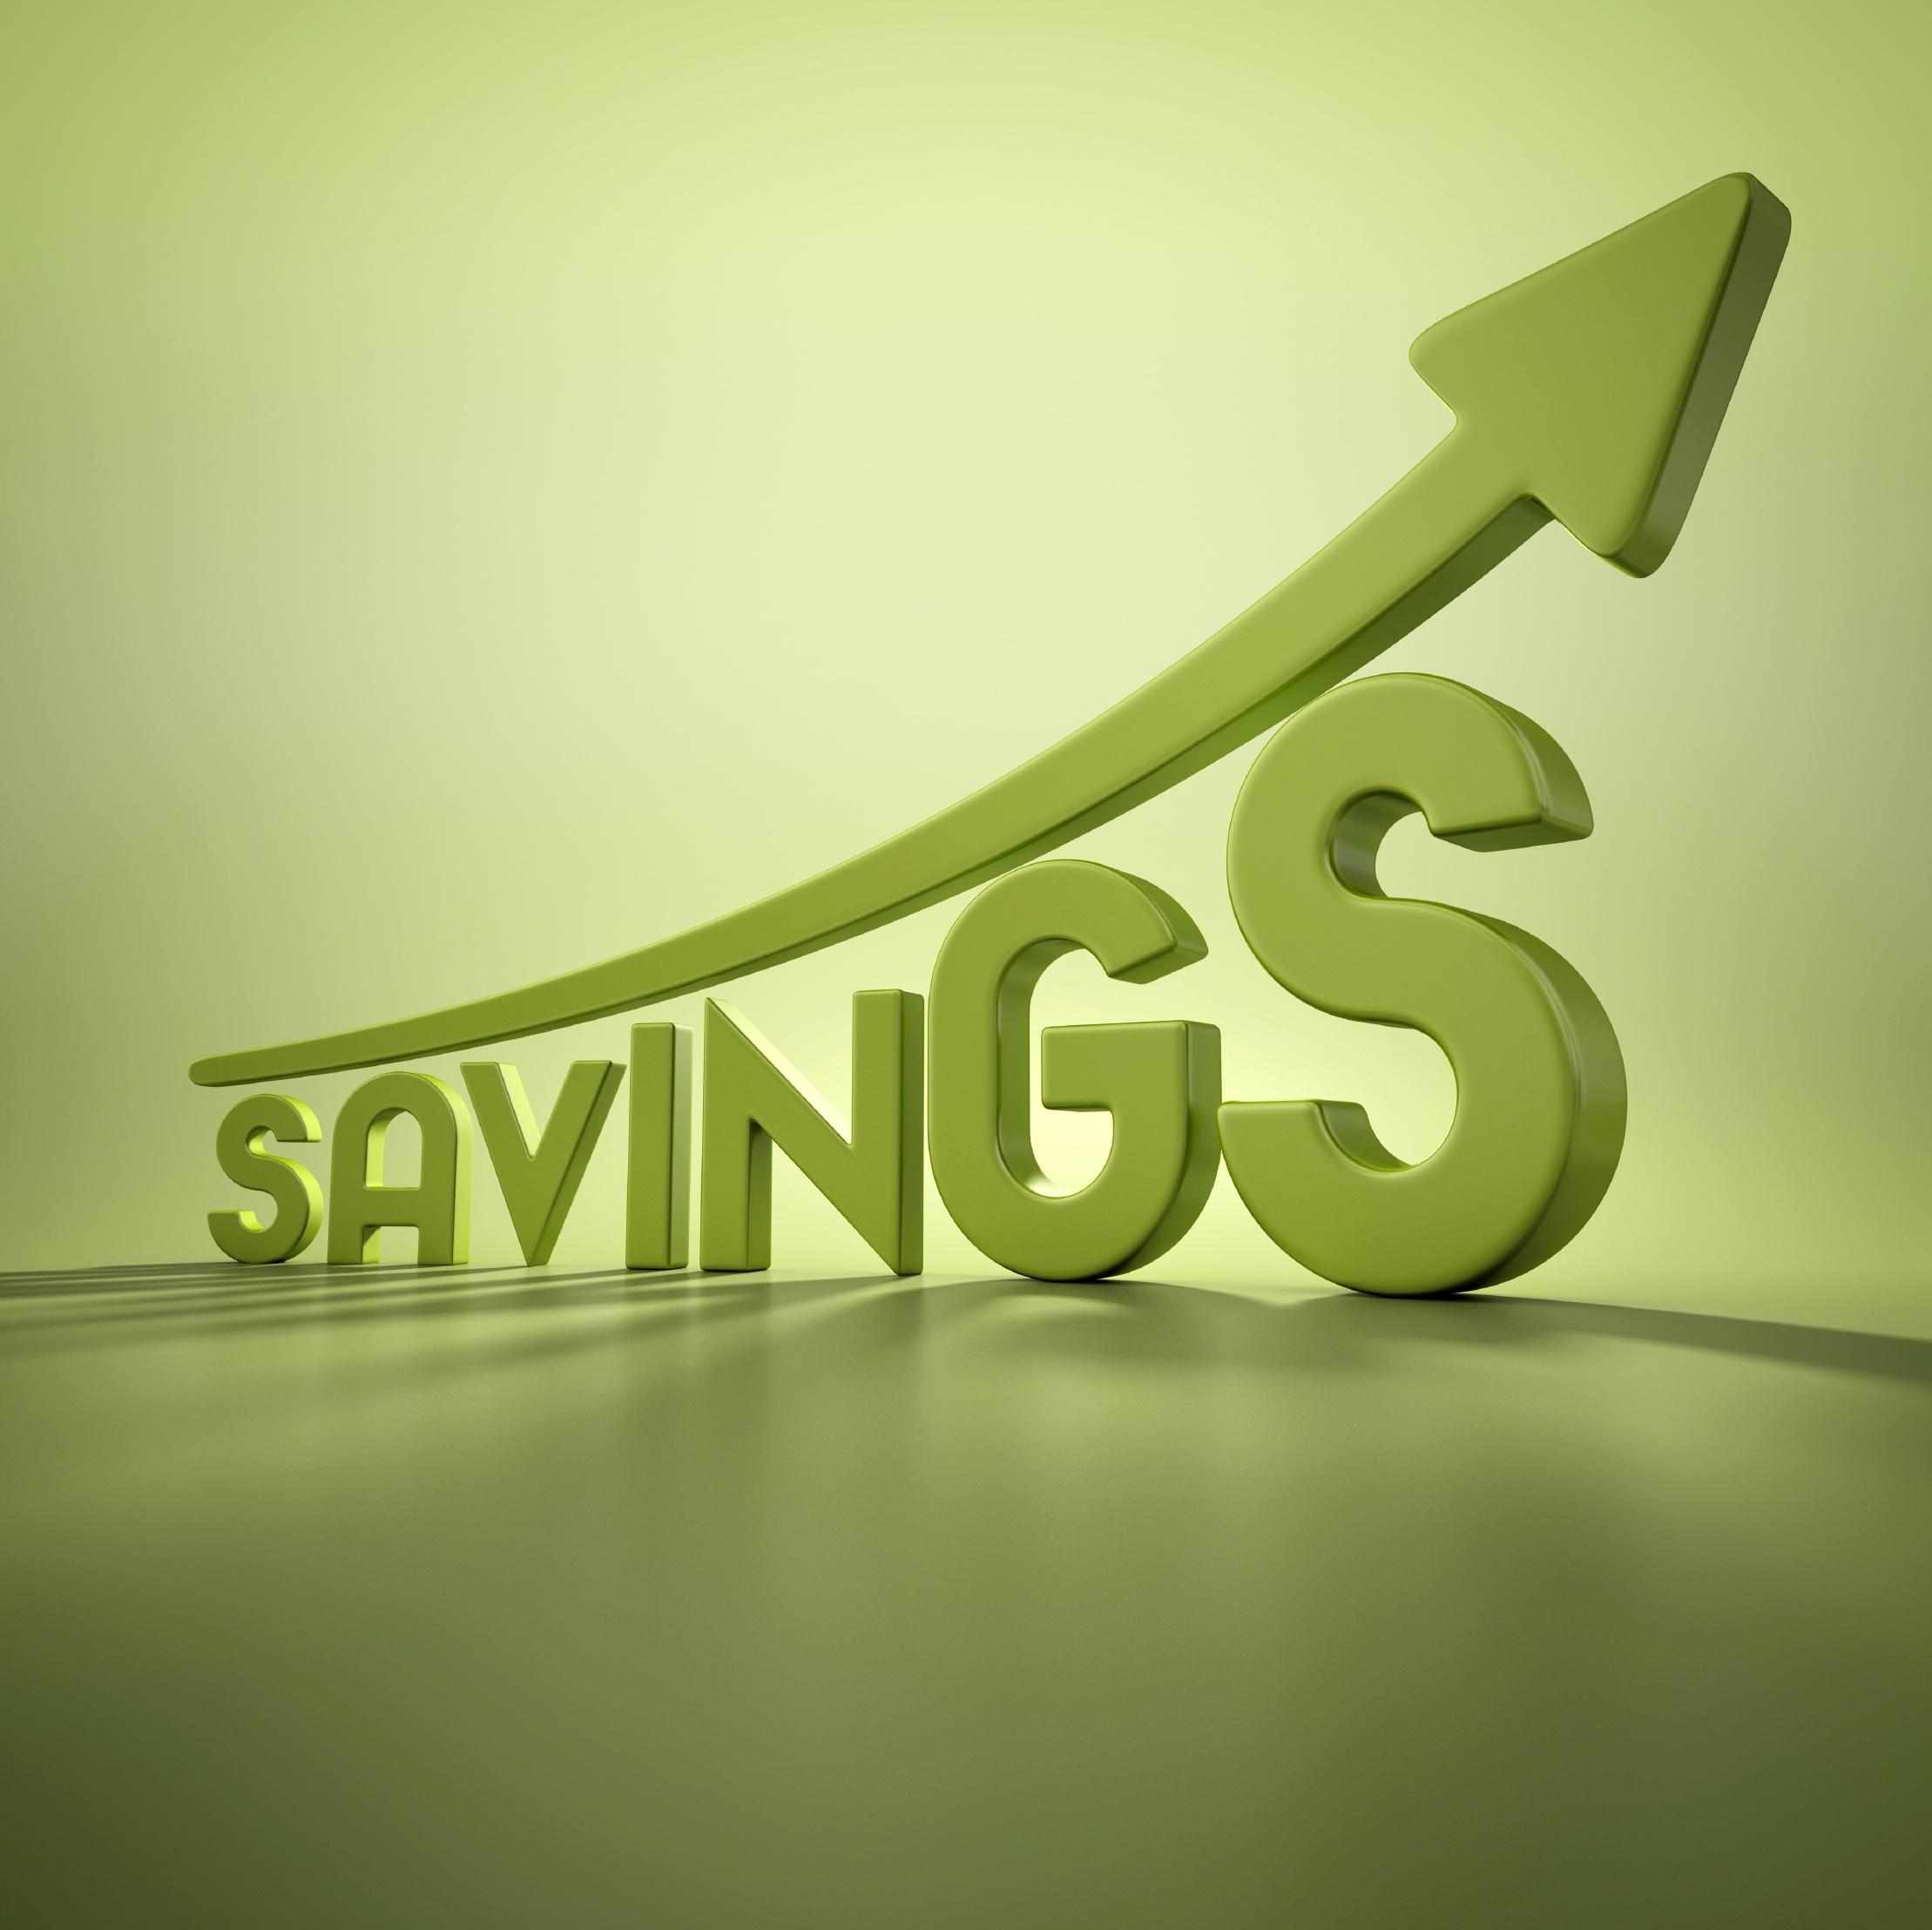 green-savings-graph-studio-000011696786_Large.jpg